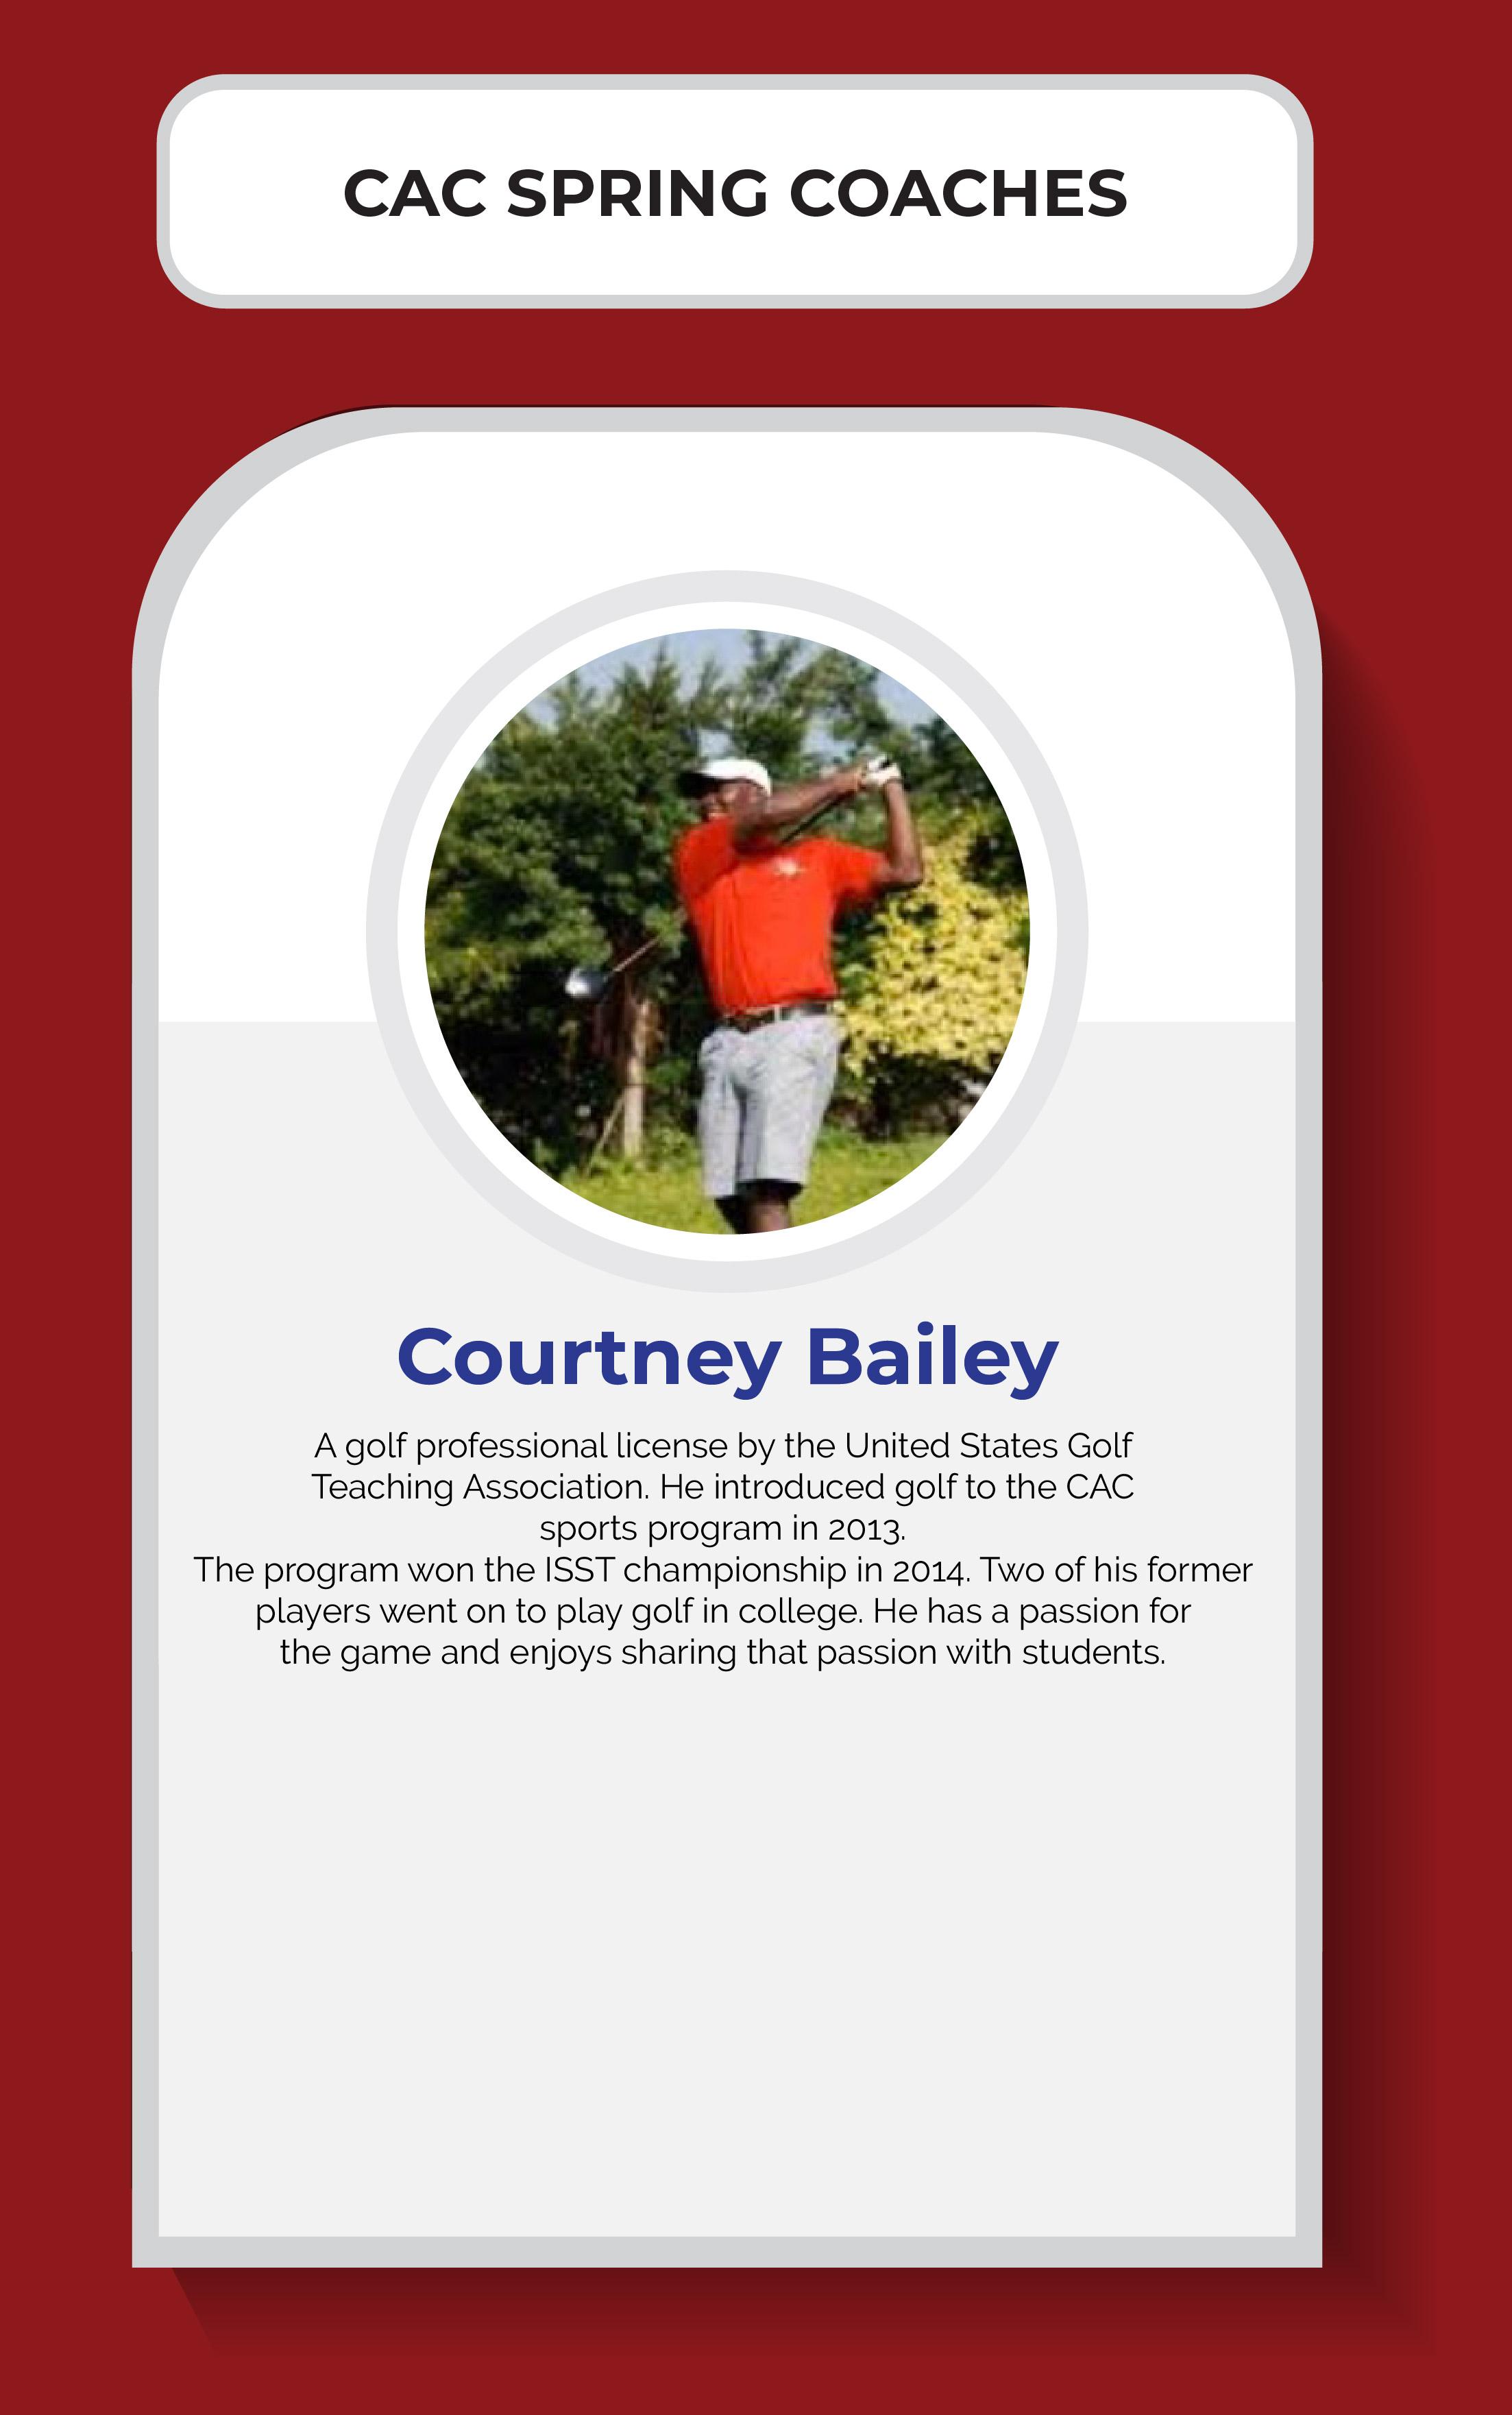 CourtneyBailey-01